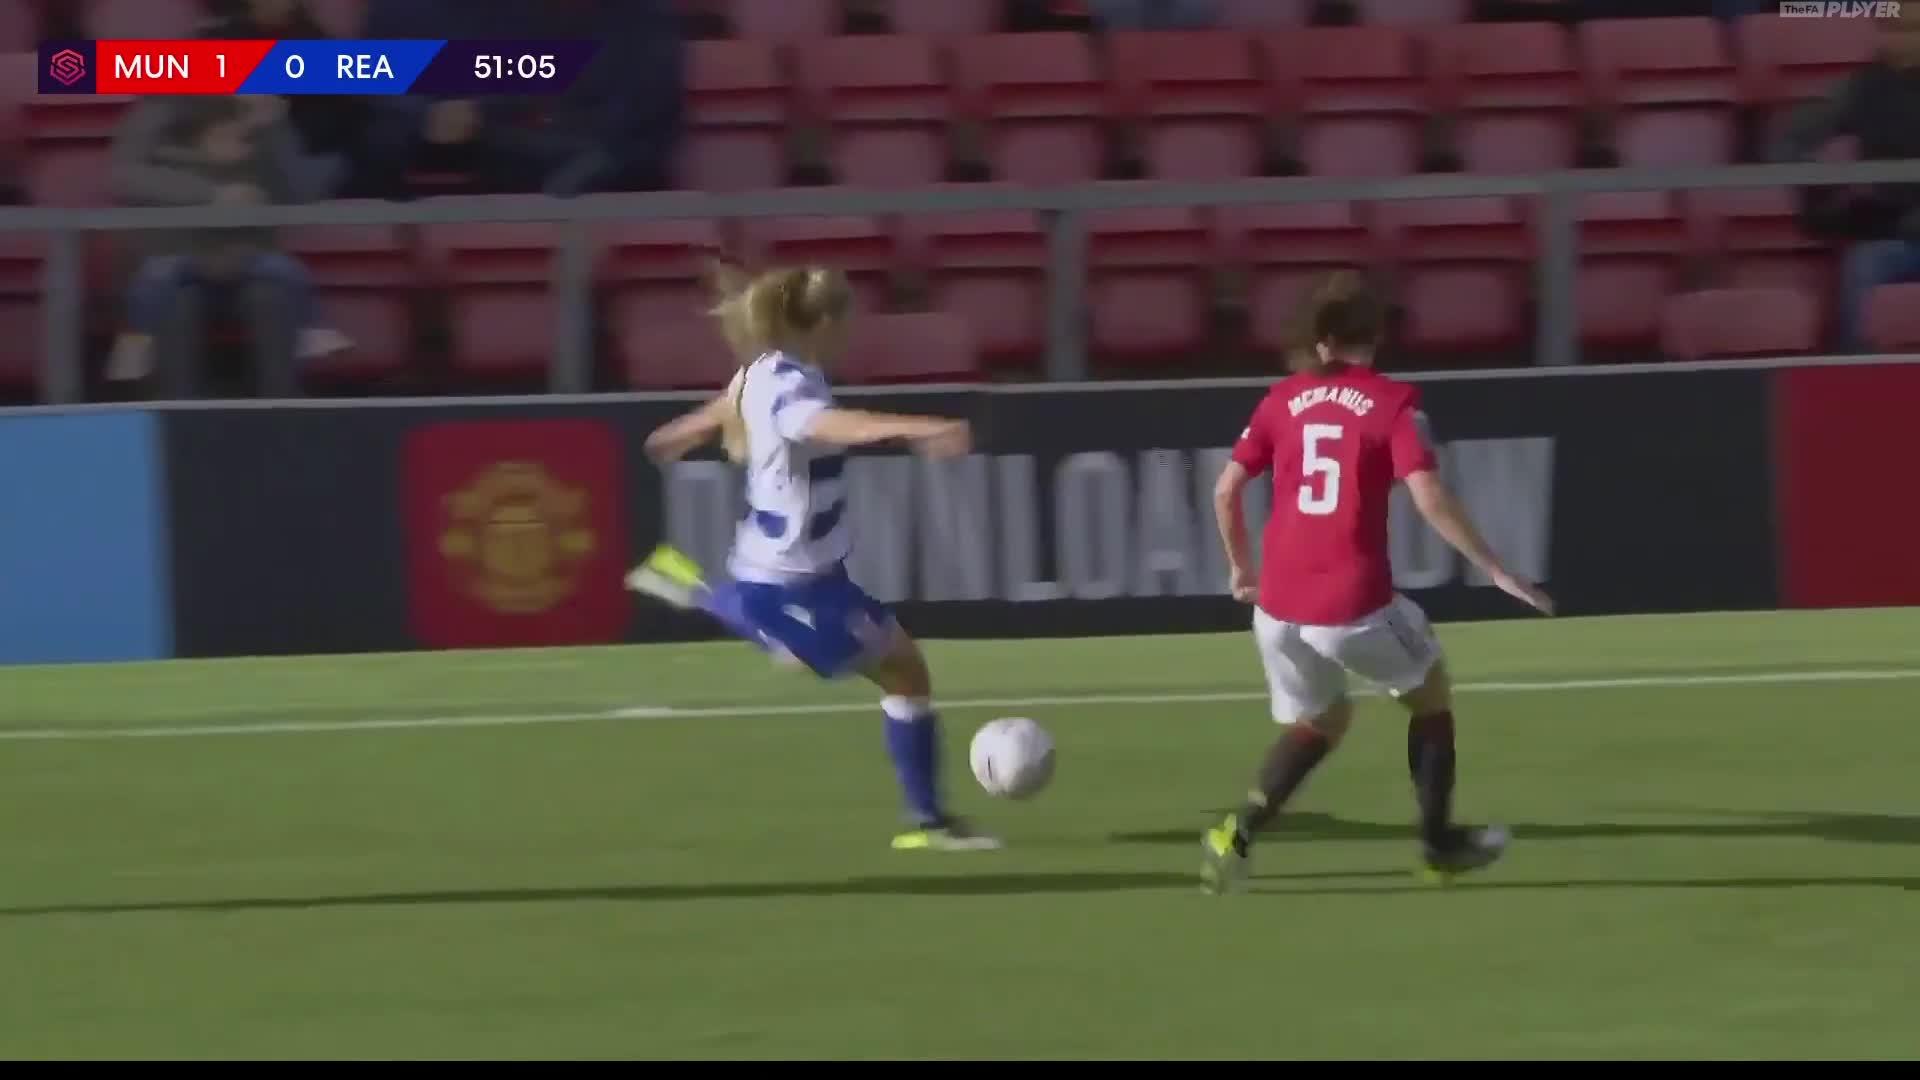 The FA Player Google Chrome 31 10 2019 13 33 50 GIF